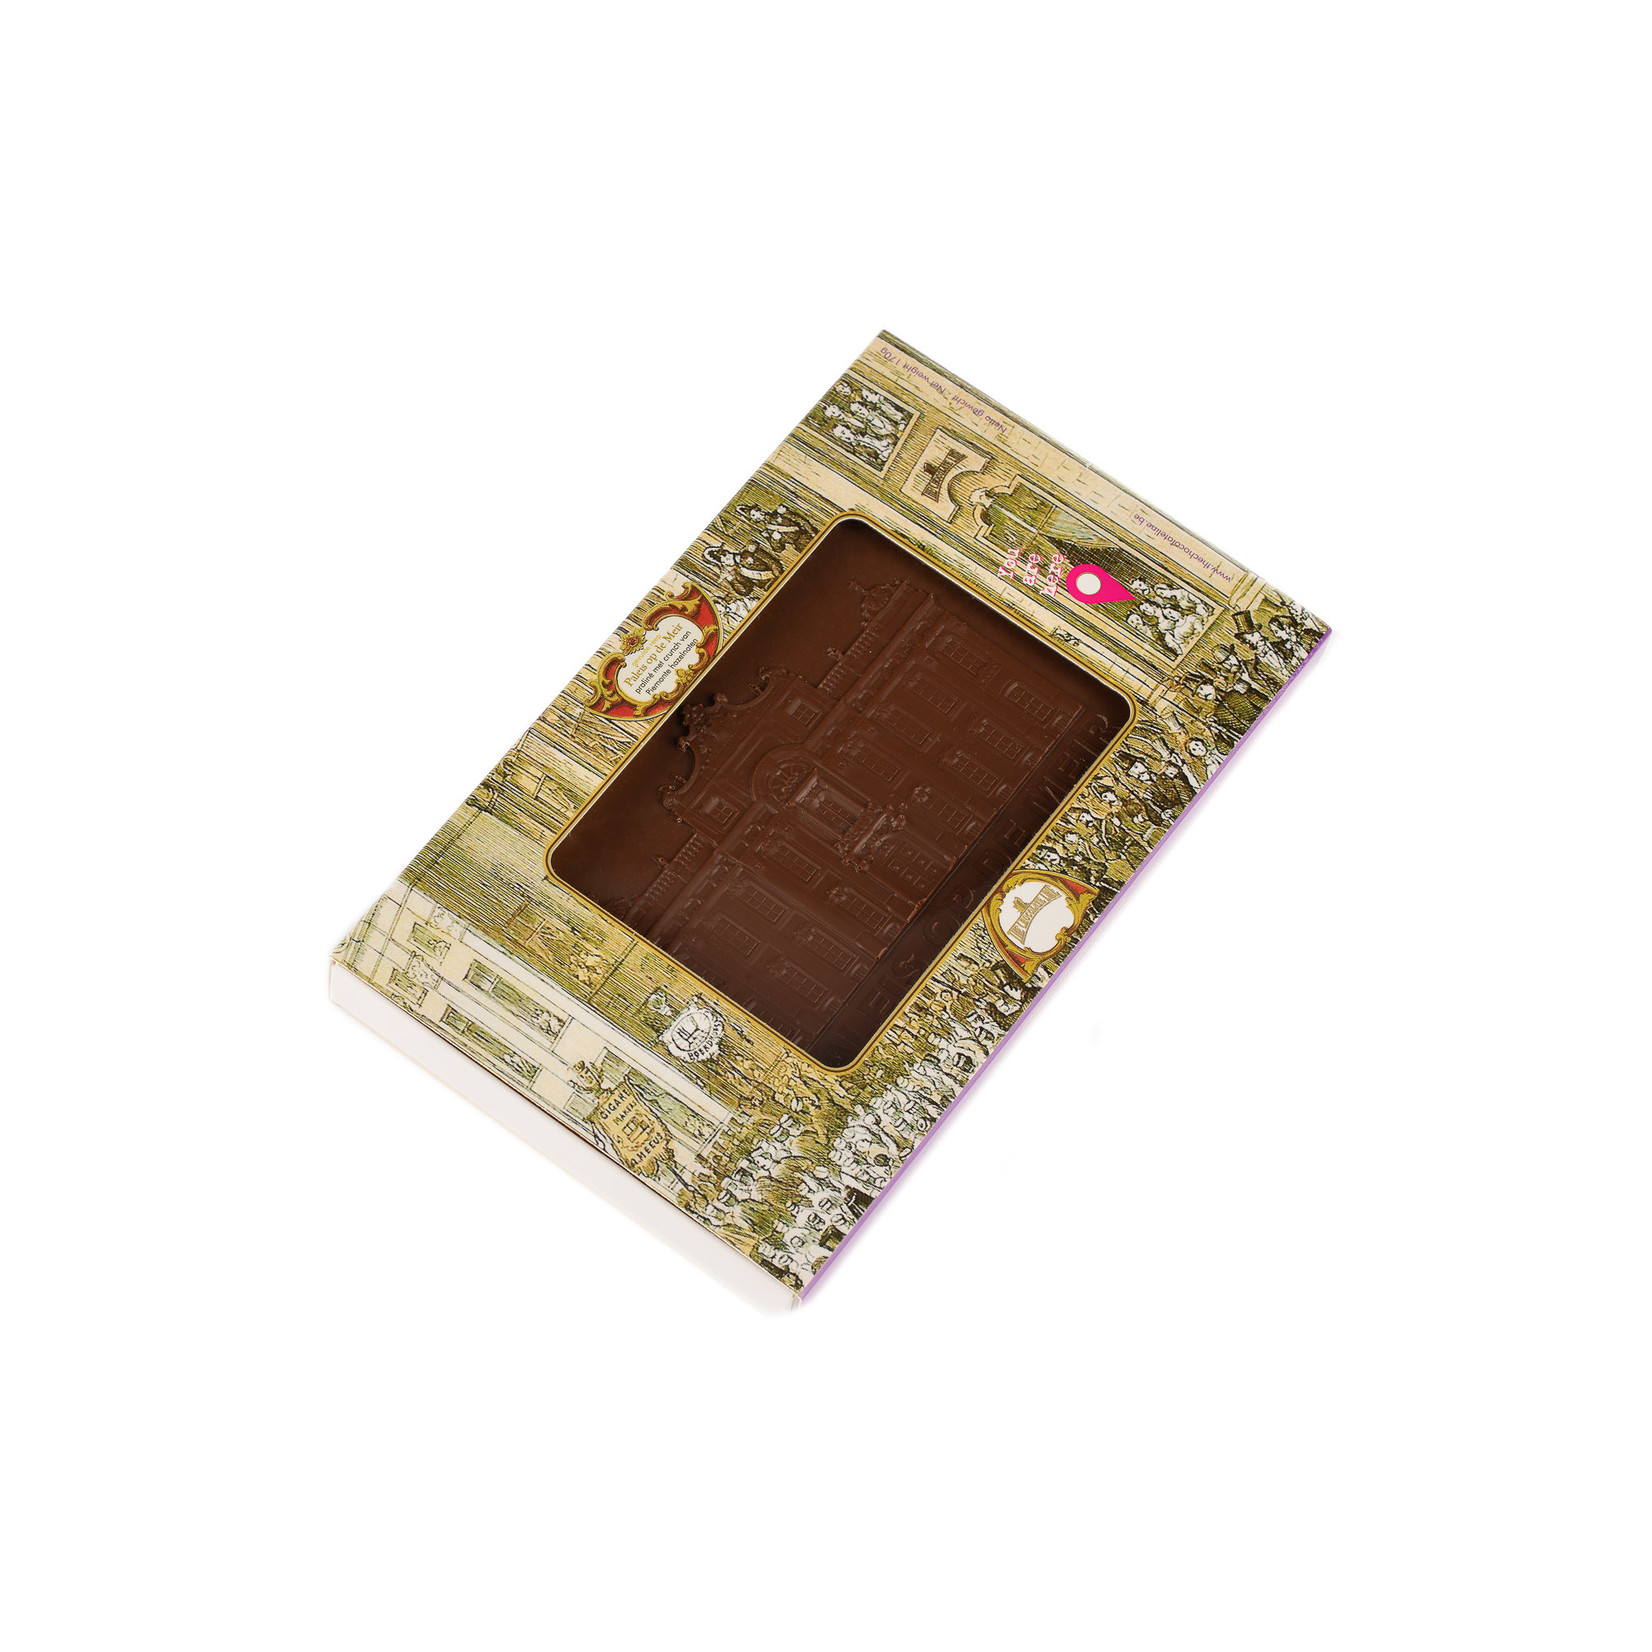 Paleis op de Meir - Chocolate Bar